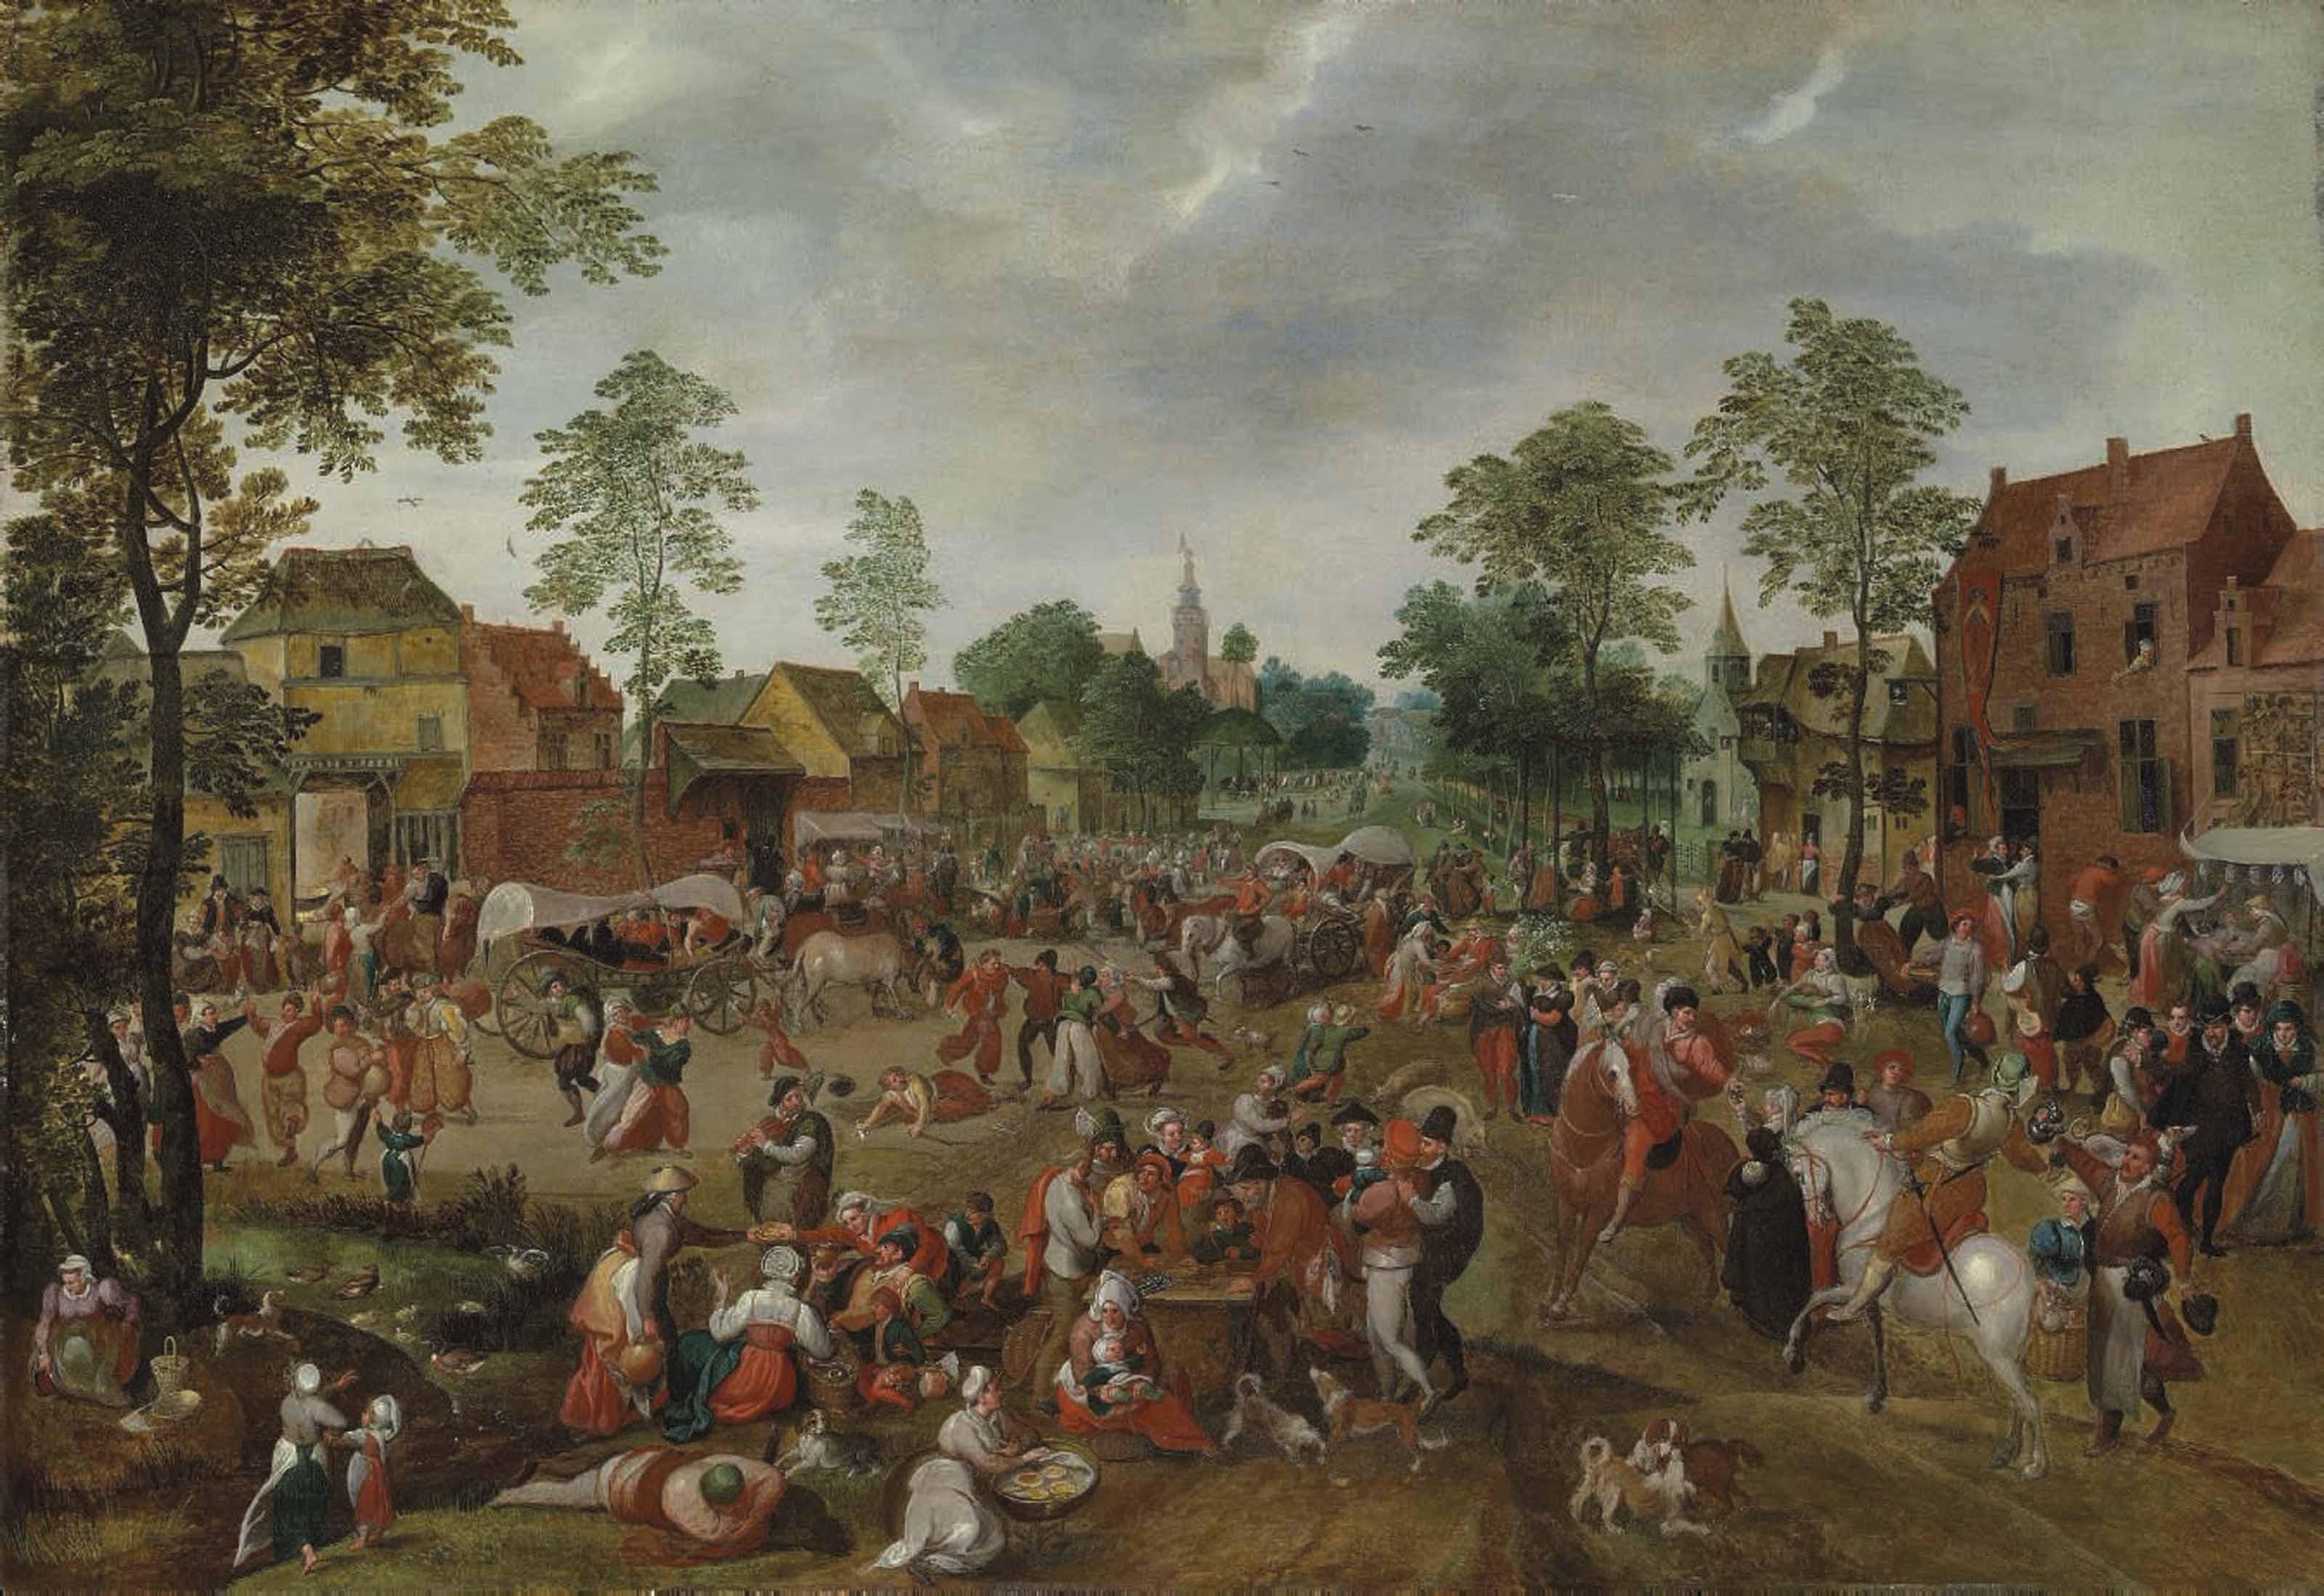 A village celebrating the kermesse of Saint George